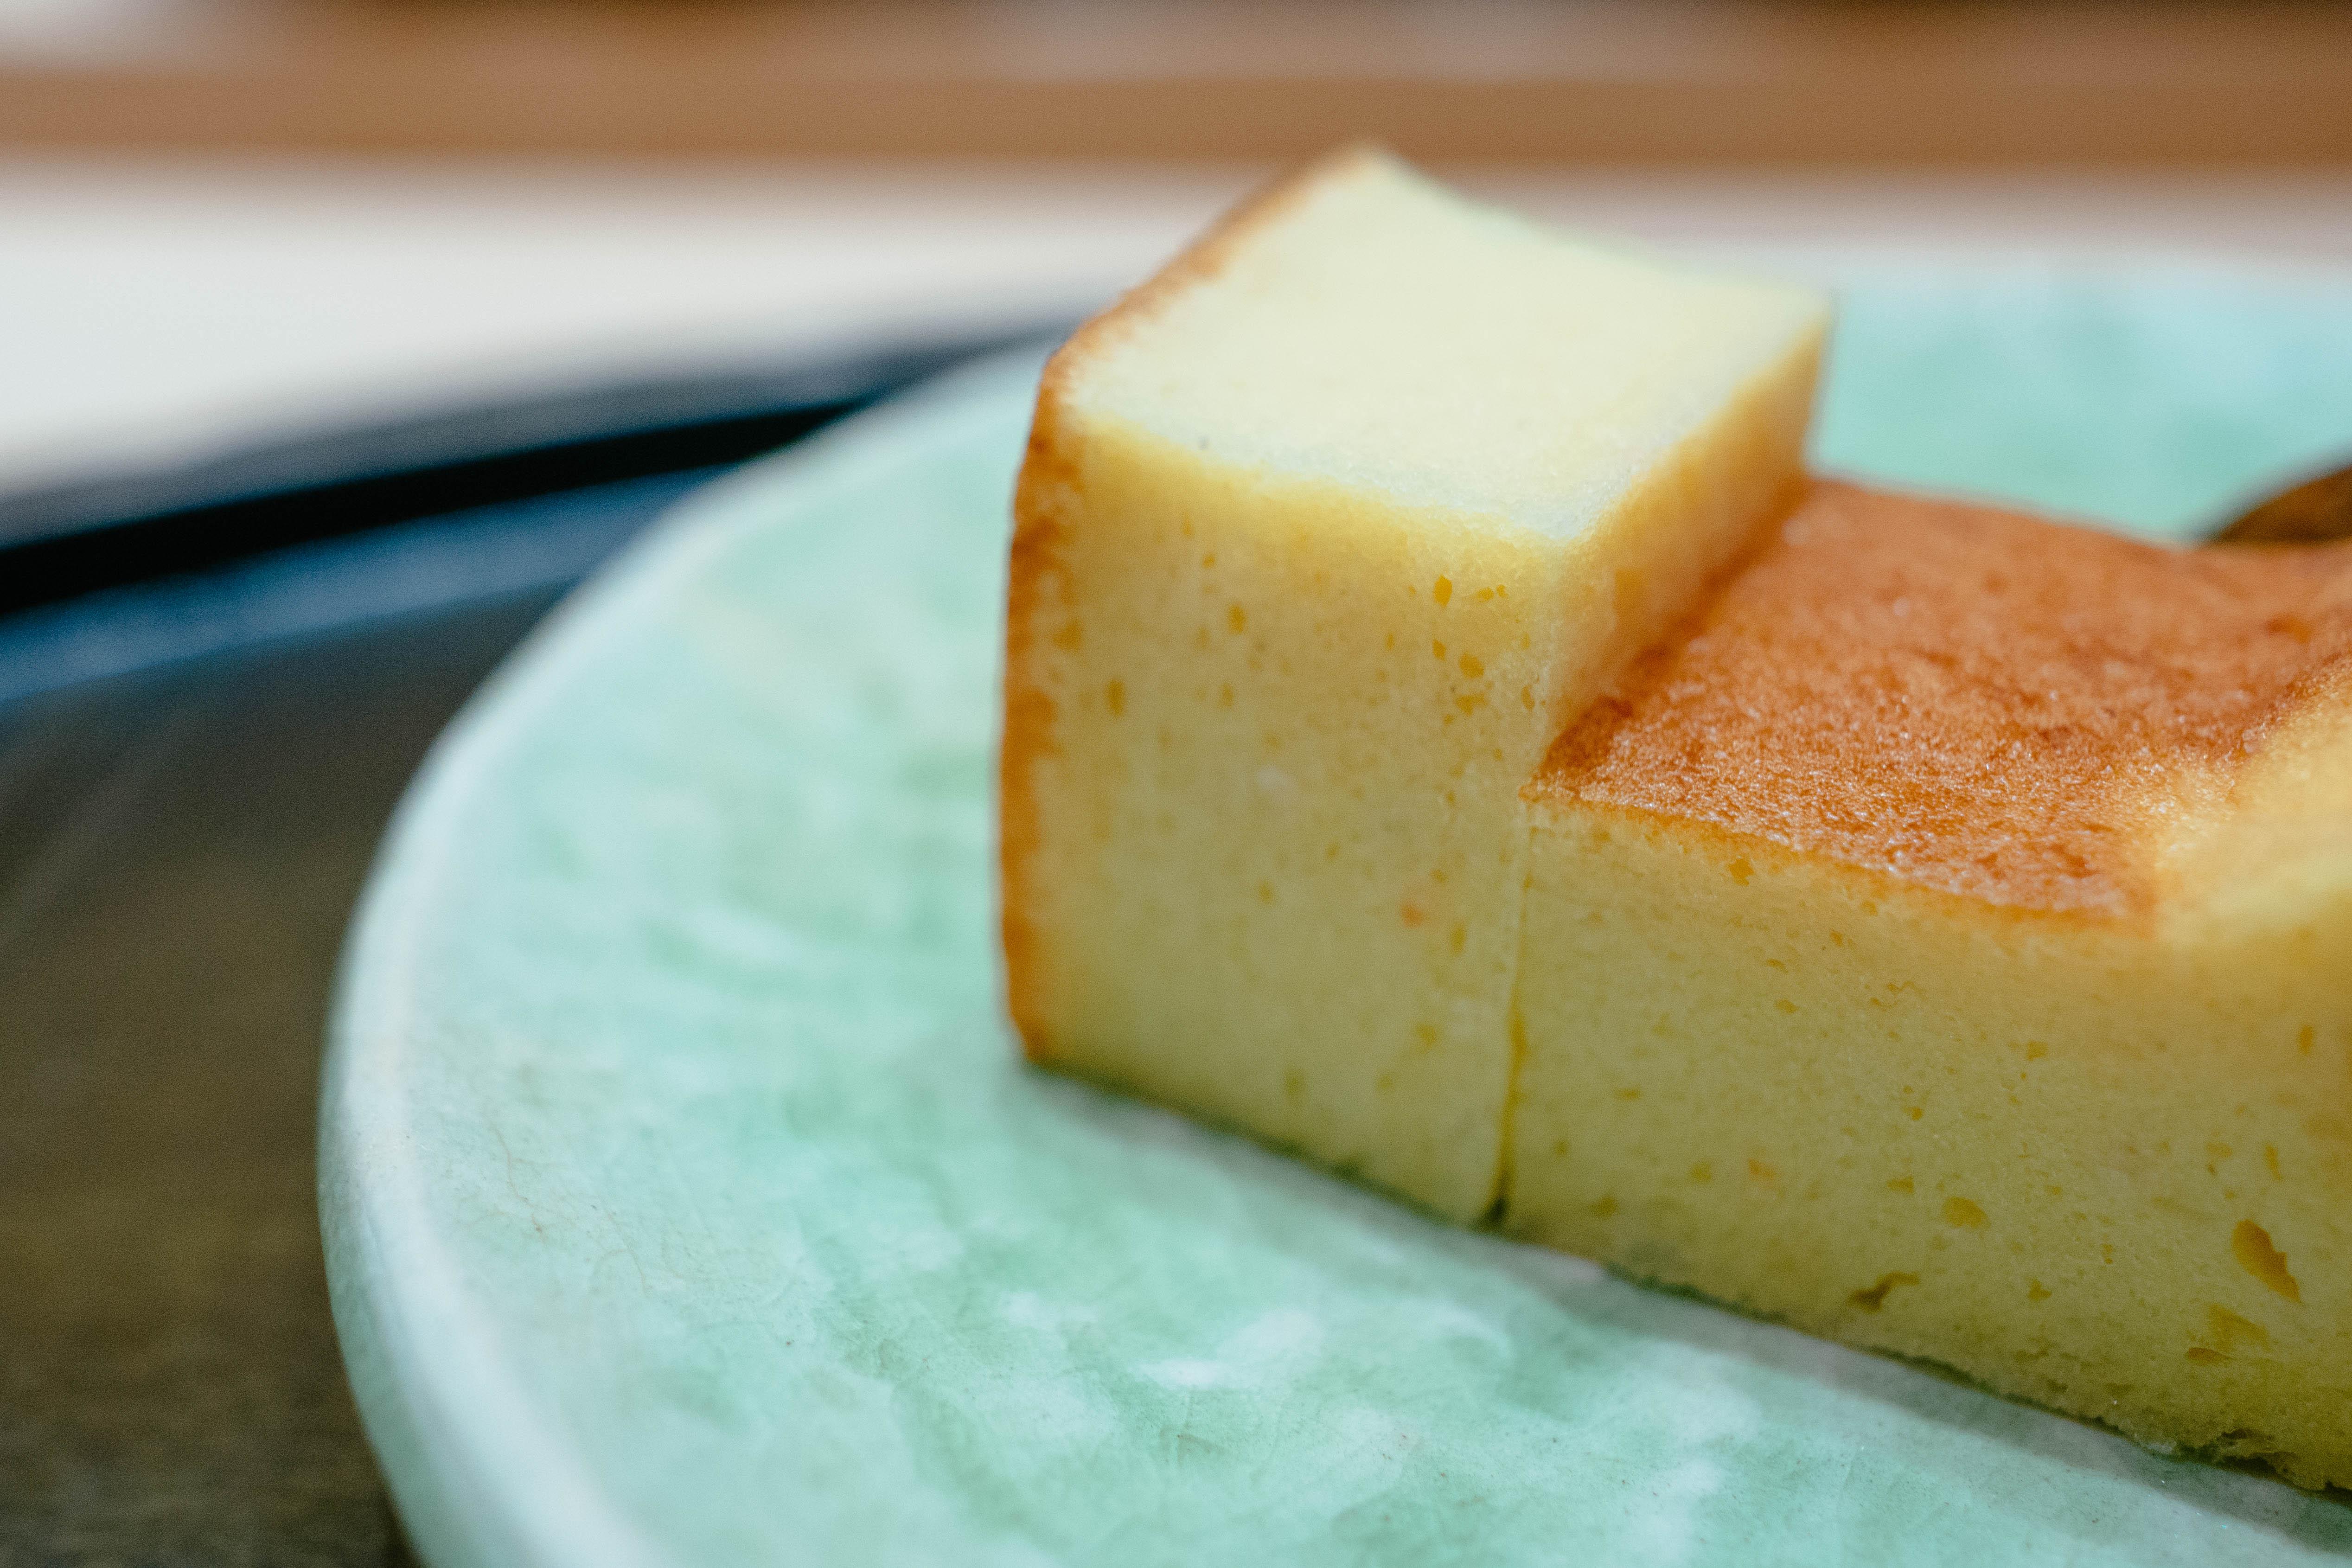 sushi-sase-hong-kong-best-sushi-restaurant-hong-kong-19